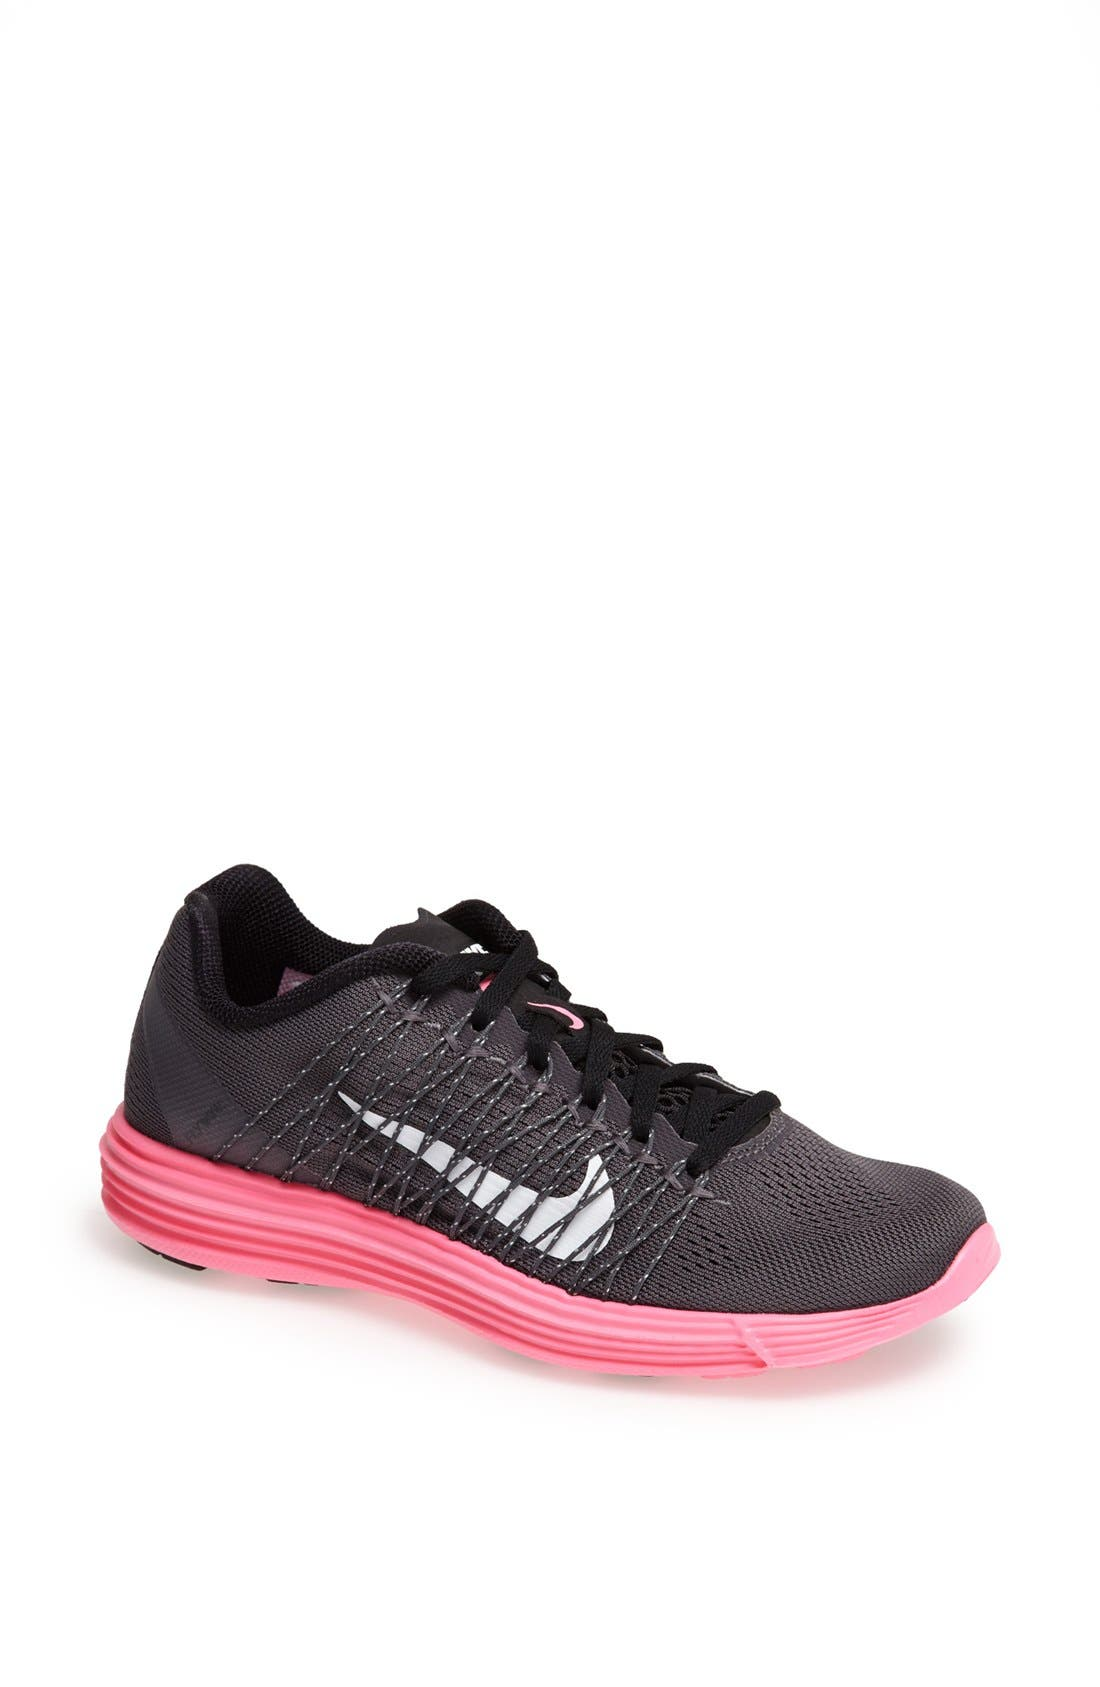 Alternate Image 1 Selected - Nike 'Lunaracer+ 3' Running Shoe (Women)